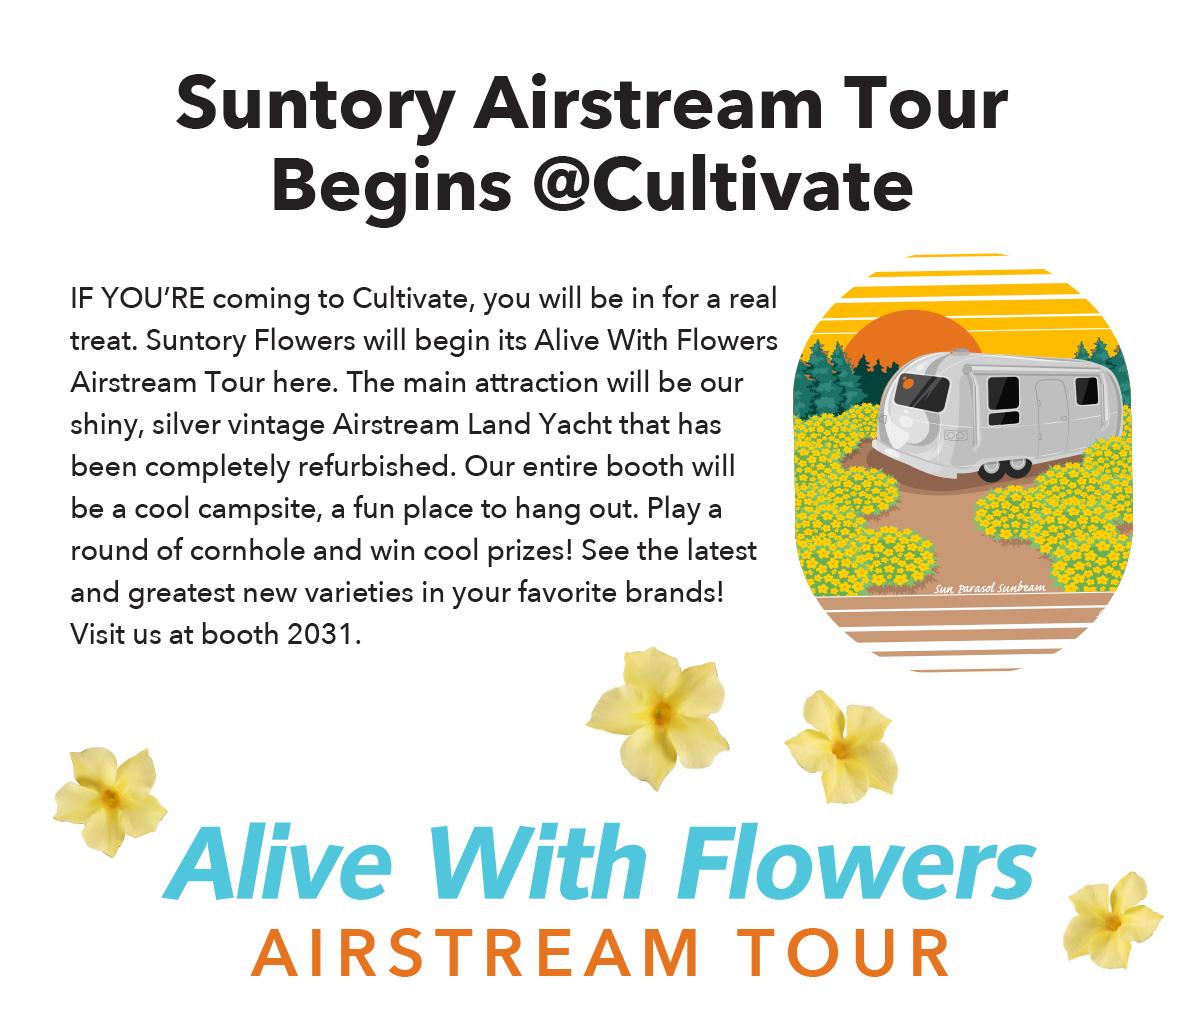 Suntory Airstream Tour Begins @Cultivate